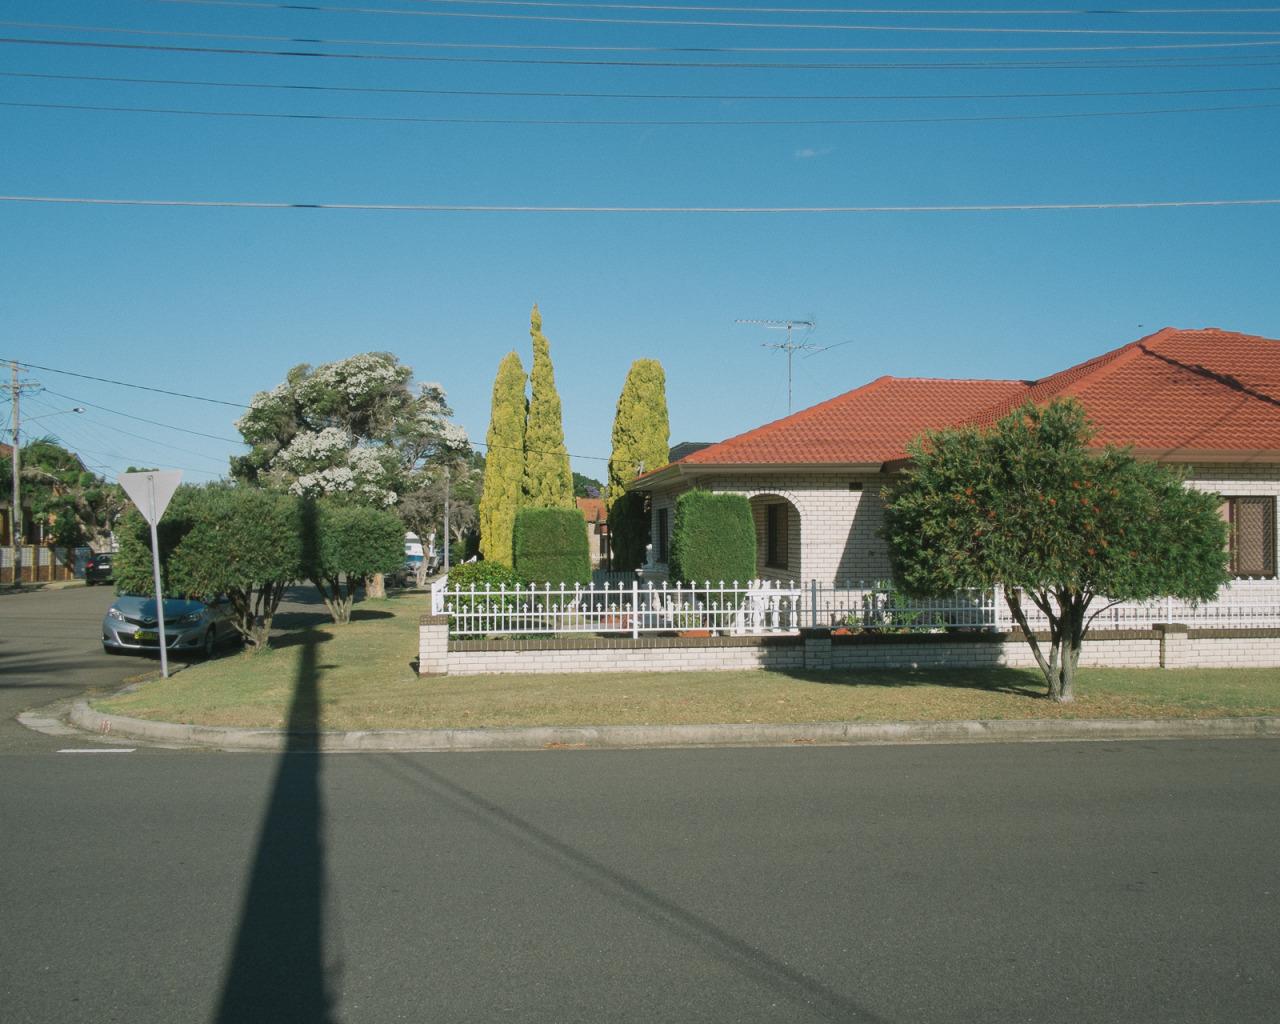 #suburbia #sansSouci #documentingspace #suburbianViews